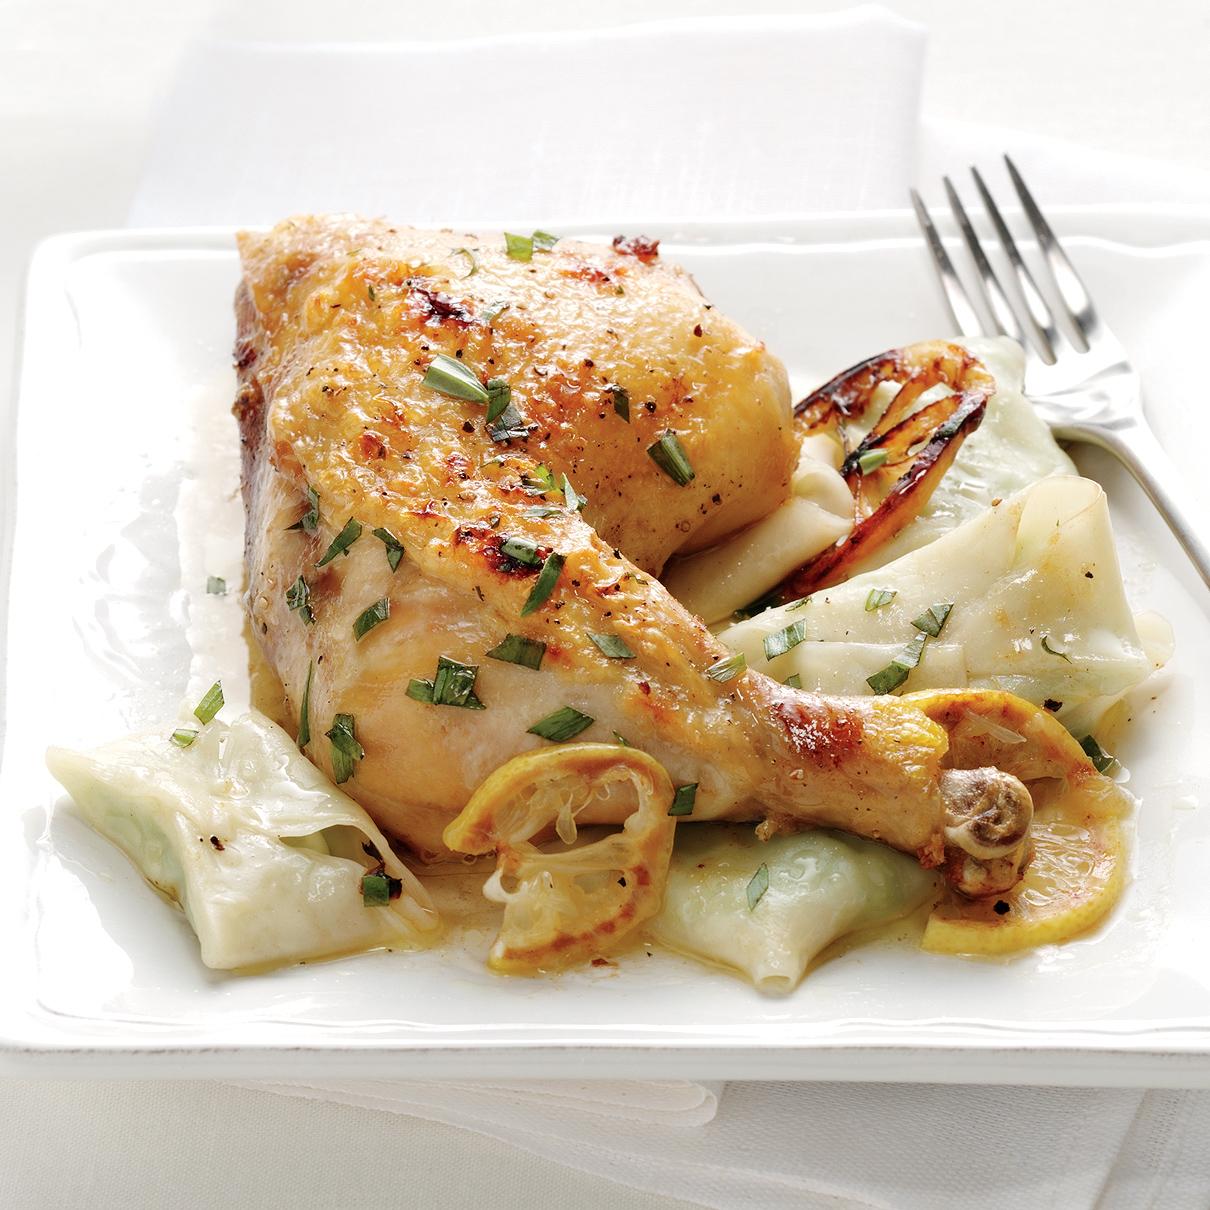 lemon-chicken-and-sweet-pea-tortellini-0310-RR-TS02-02